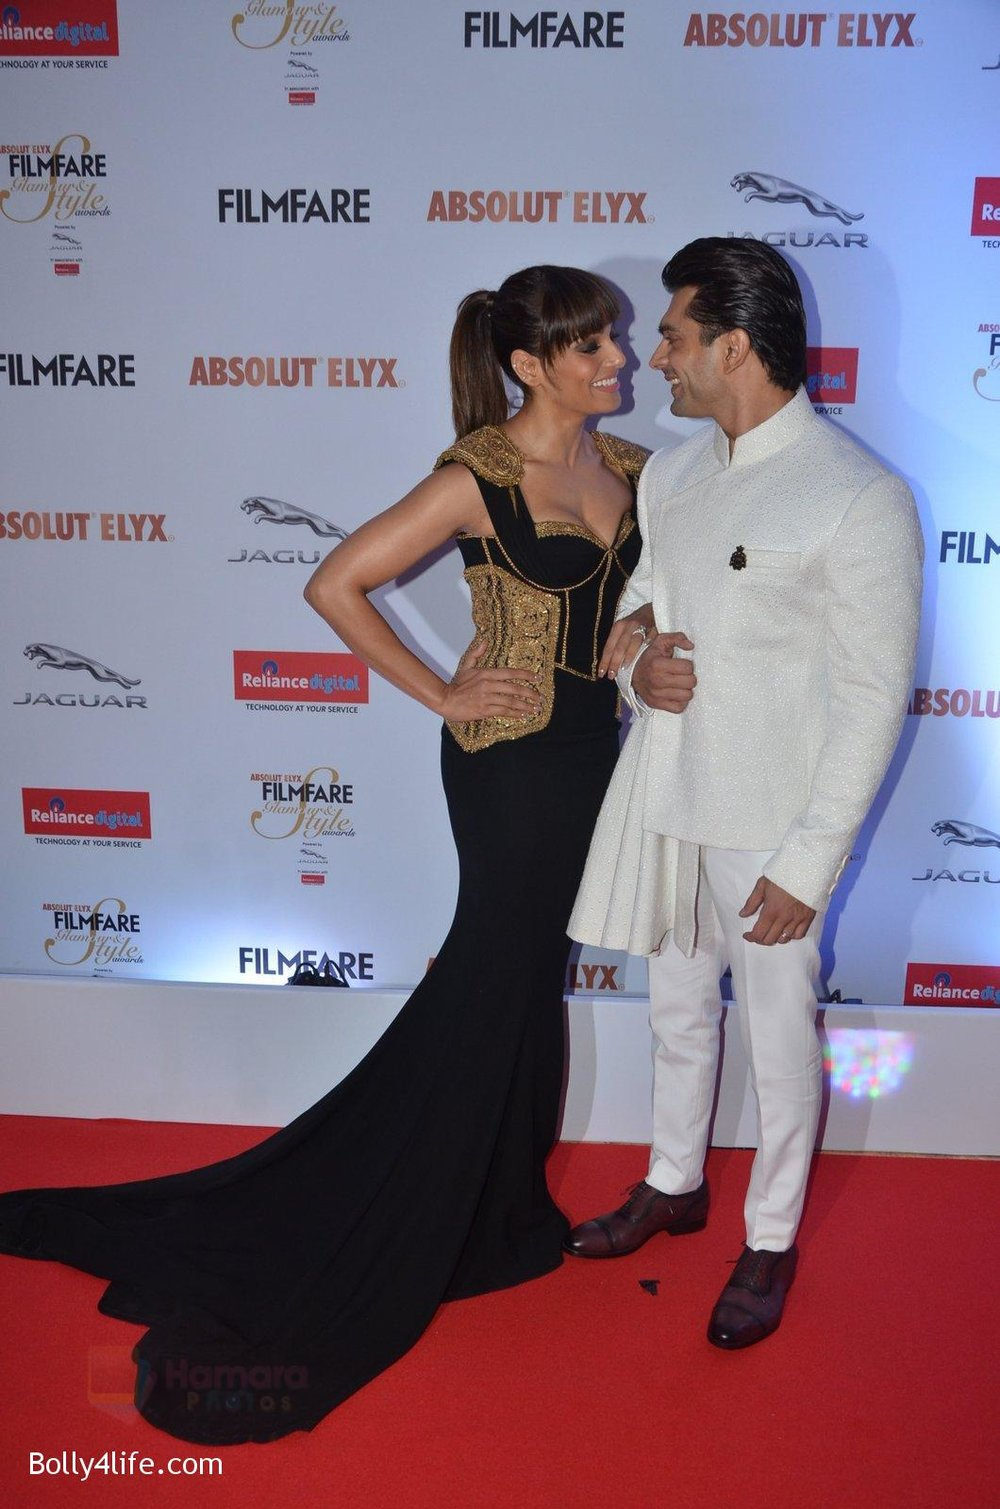 Bipasha-Basu-Karan-Singh-Grover-at-Filmfare-Glamour-Style-Awards-2016-in-Mumbai-on-15th-Oct-2016-1944.jpg